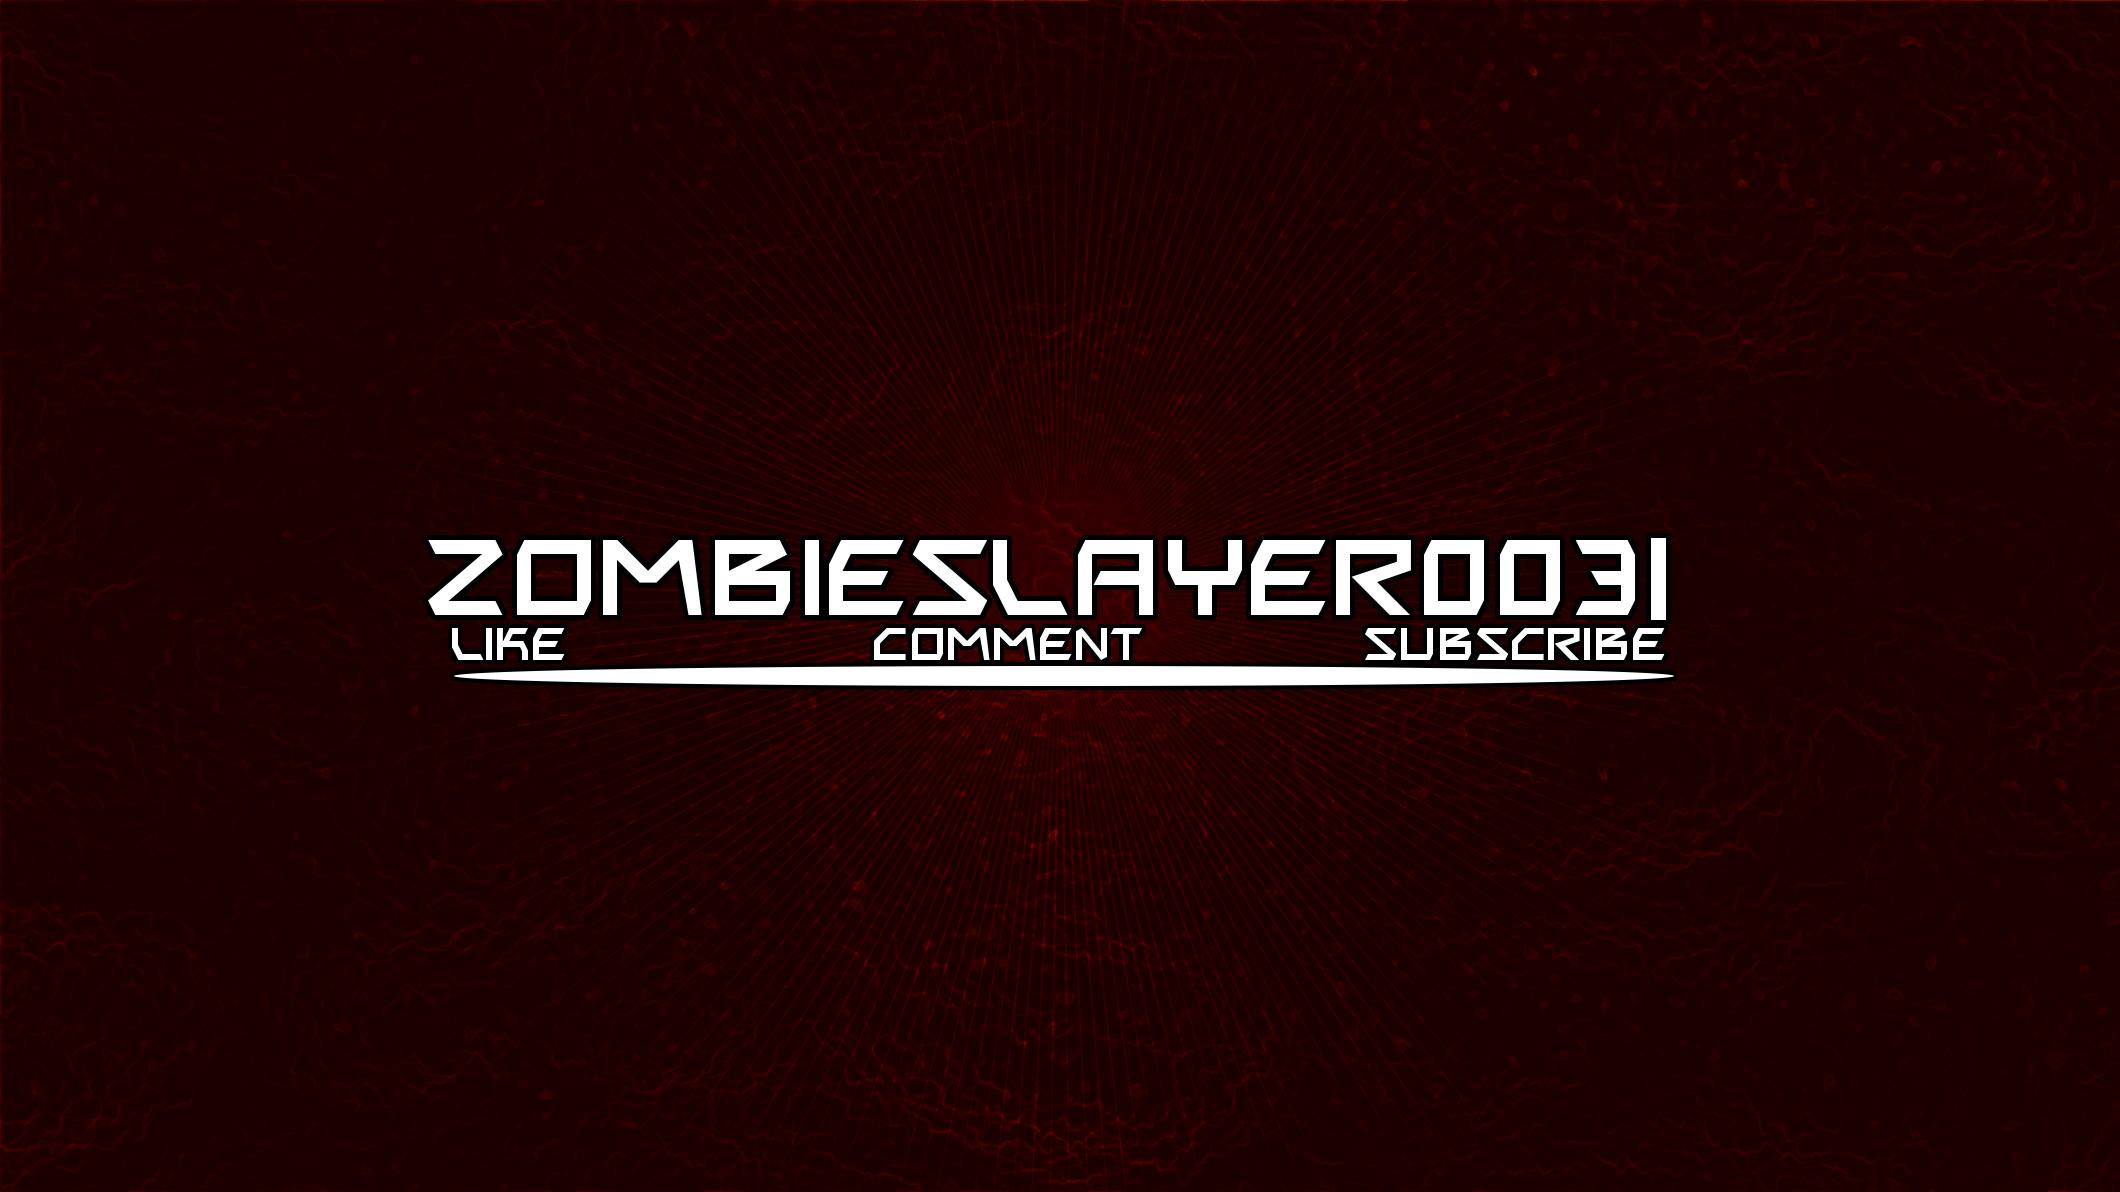 ZombieSlayer0031 - Custom Channel Art by EverBadDesigns on DeviantArt